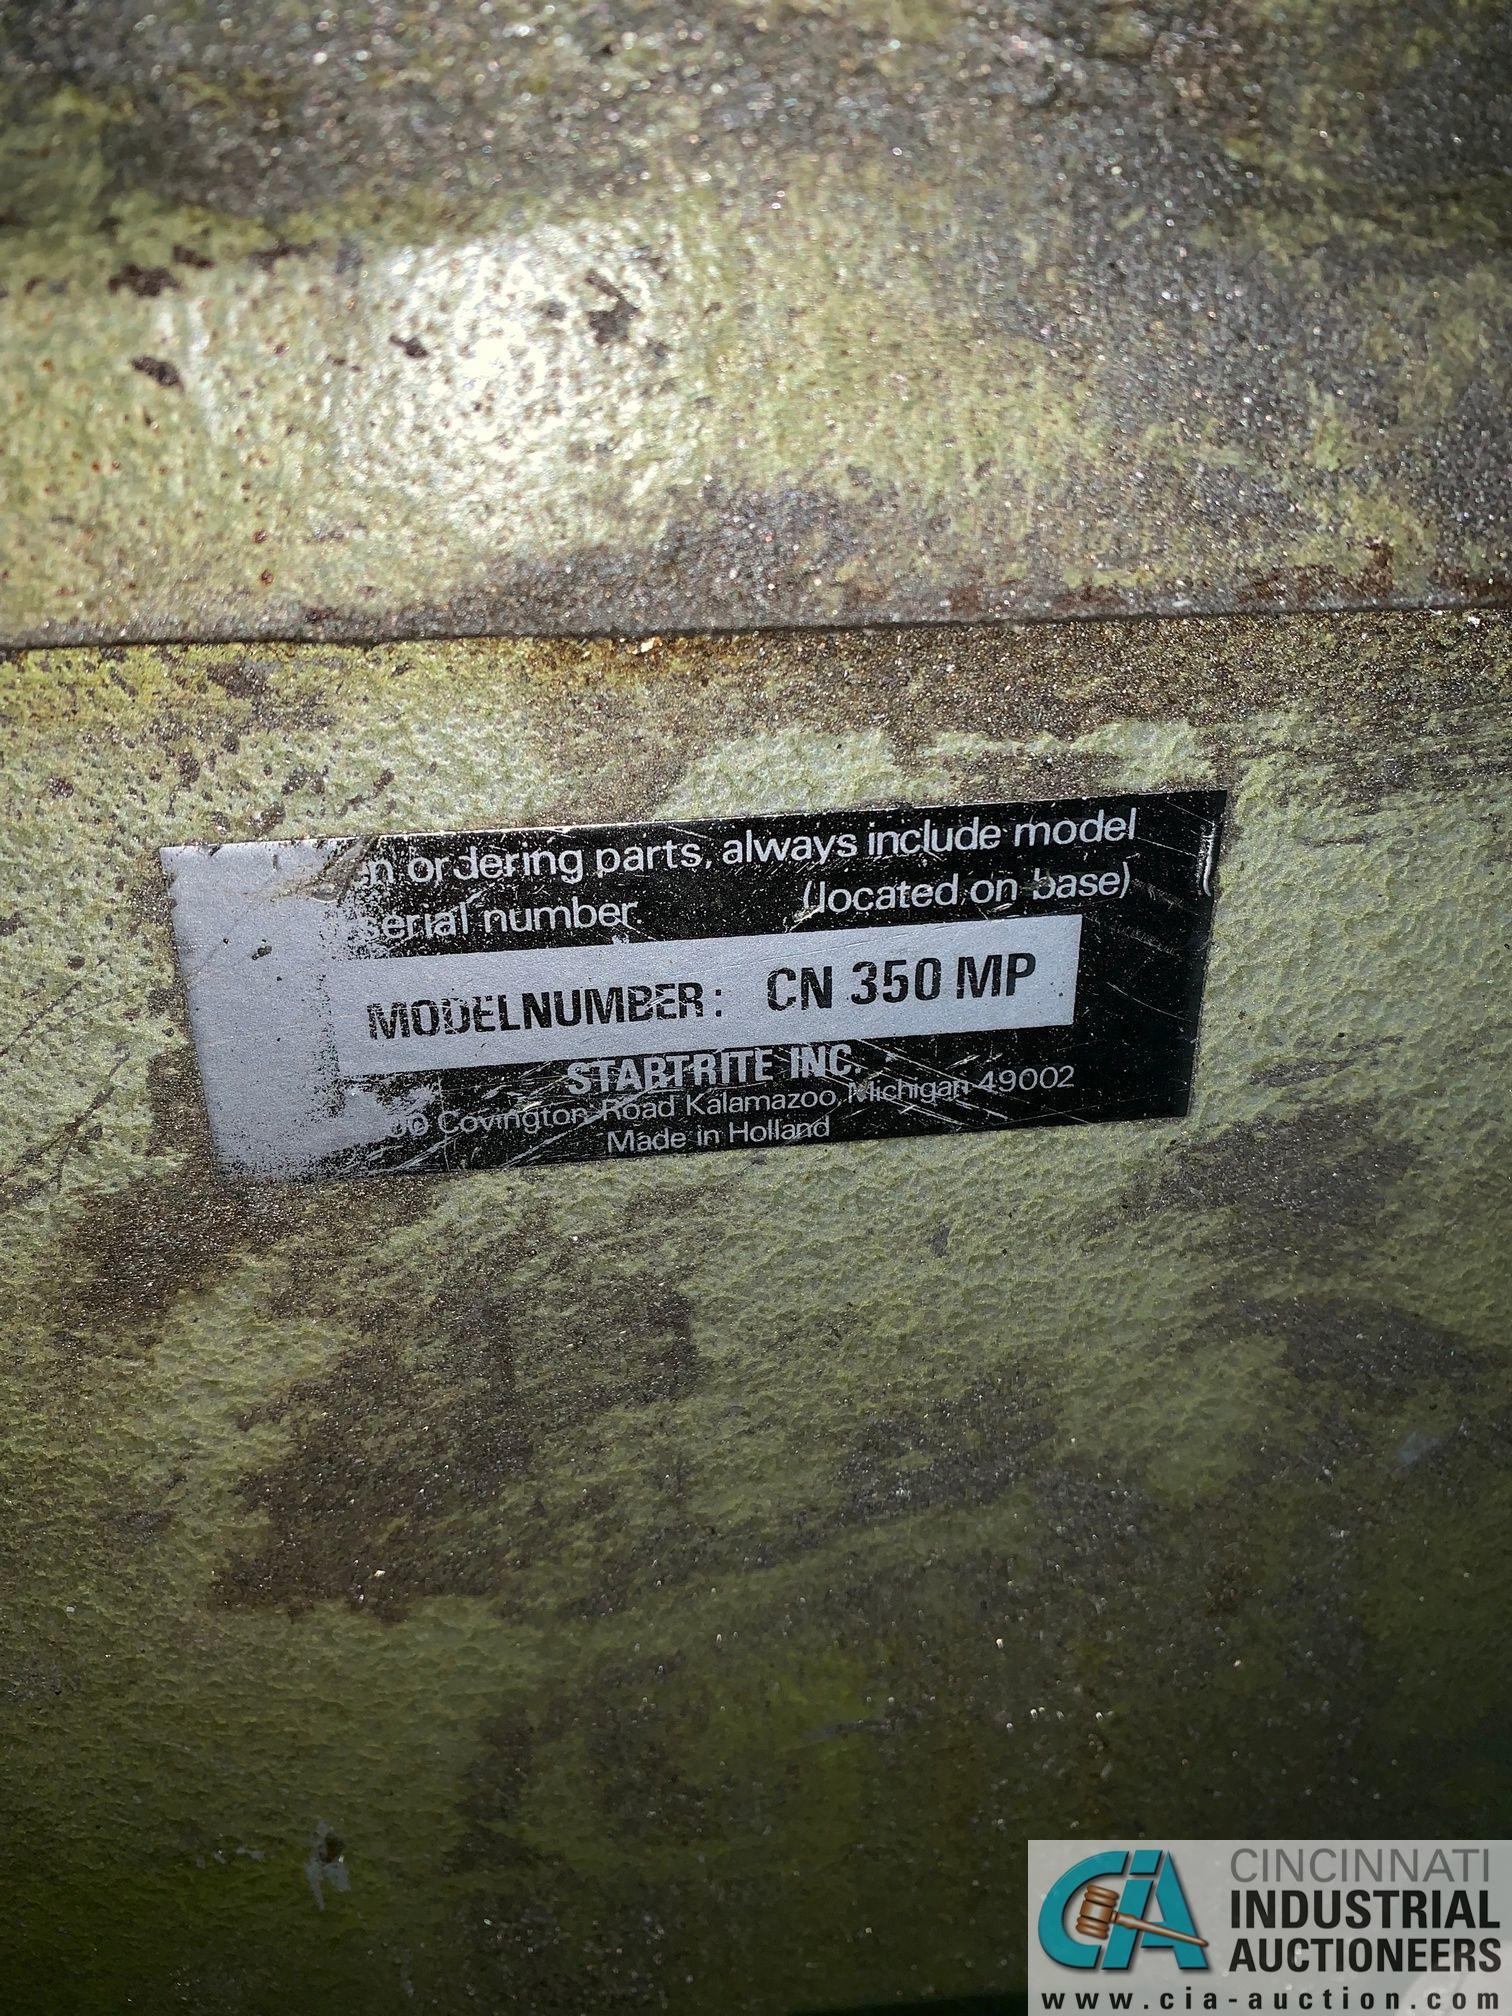 "14"" STARTRITE MANUAL CIRCULAR NON FERROUS COLD SAW **LOCATED AT 1400 OAK ST., TOLEDO, OHIO** - Image 3 of 3"